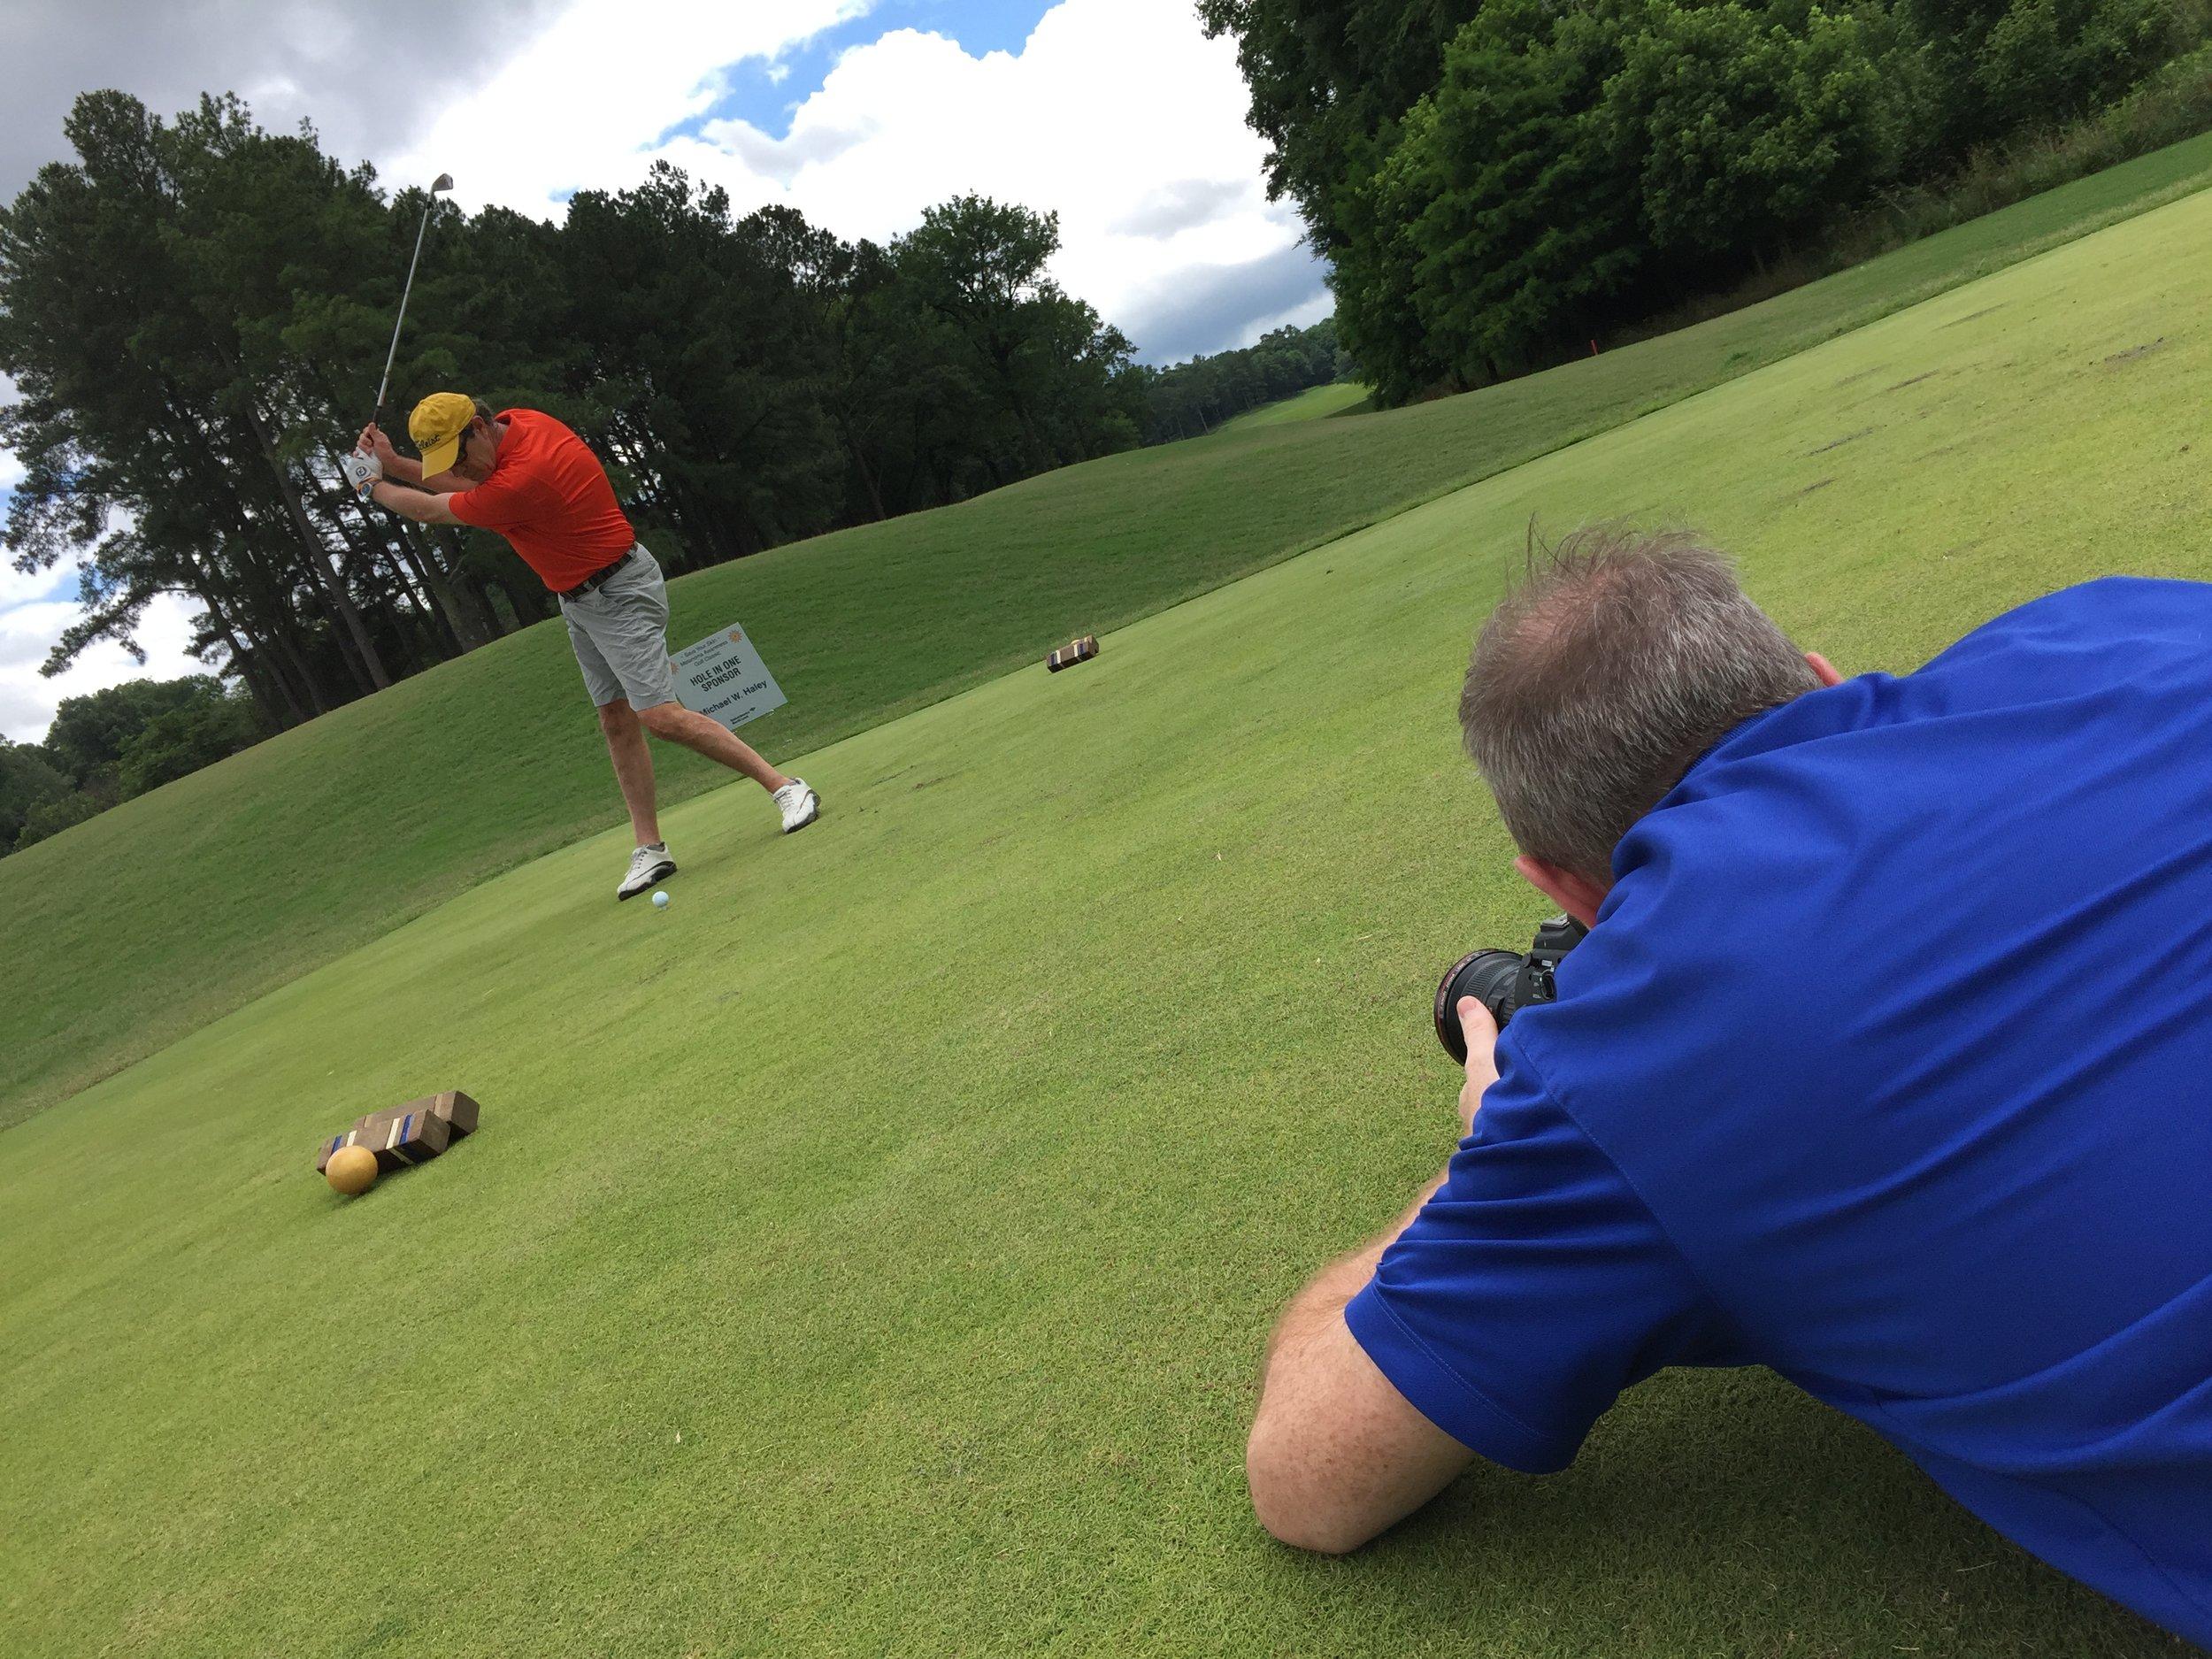 ScottS_OnTheGround_golf.JPG